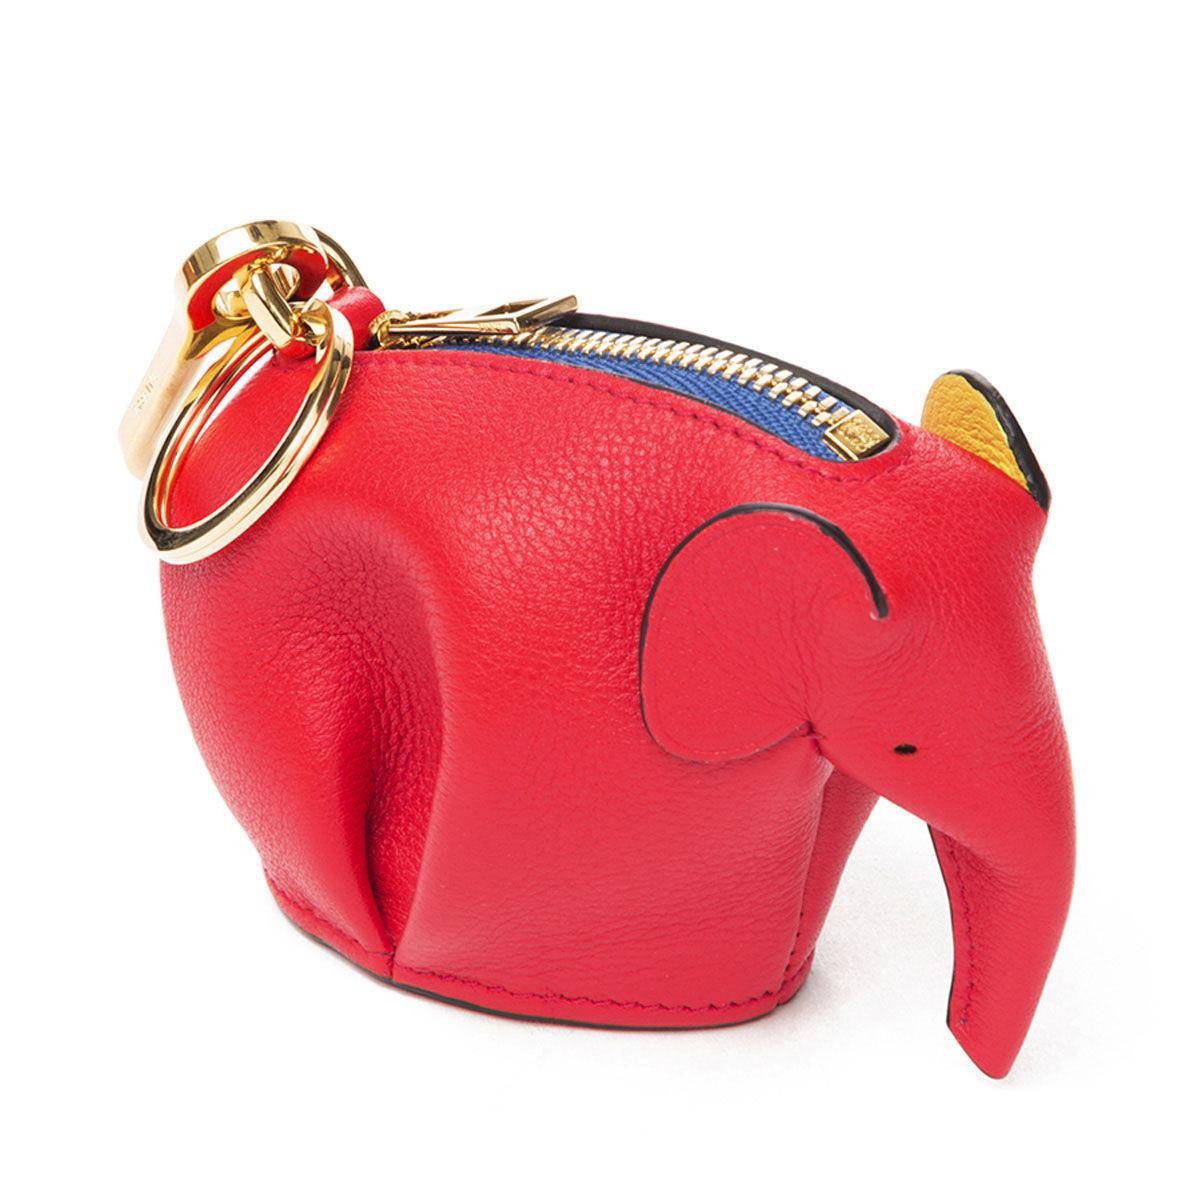 LOEWE Elephant Charm Red/Yellow all